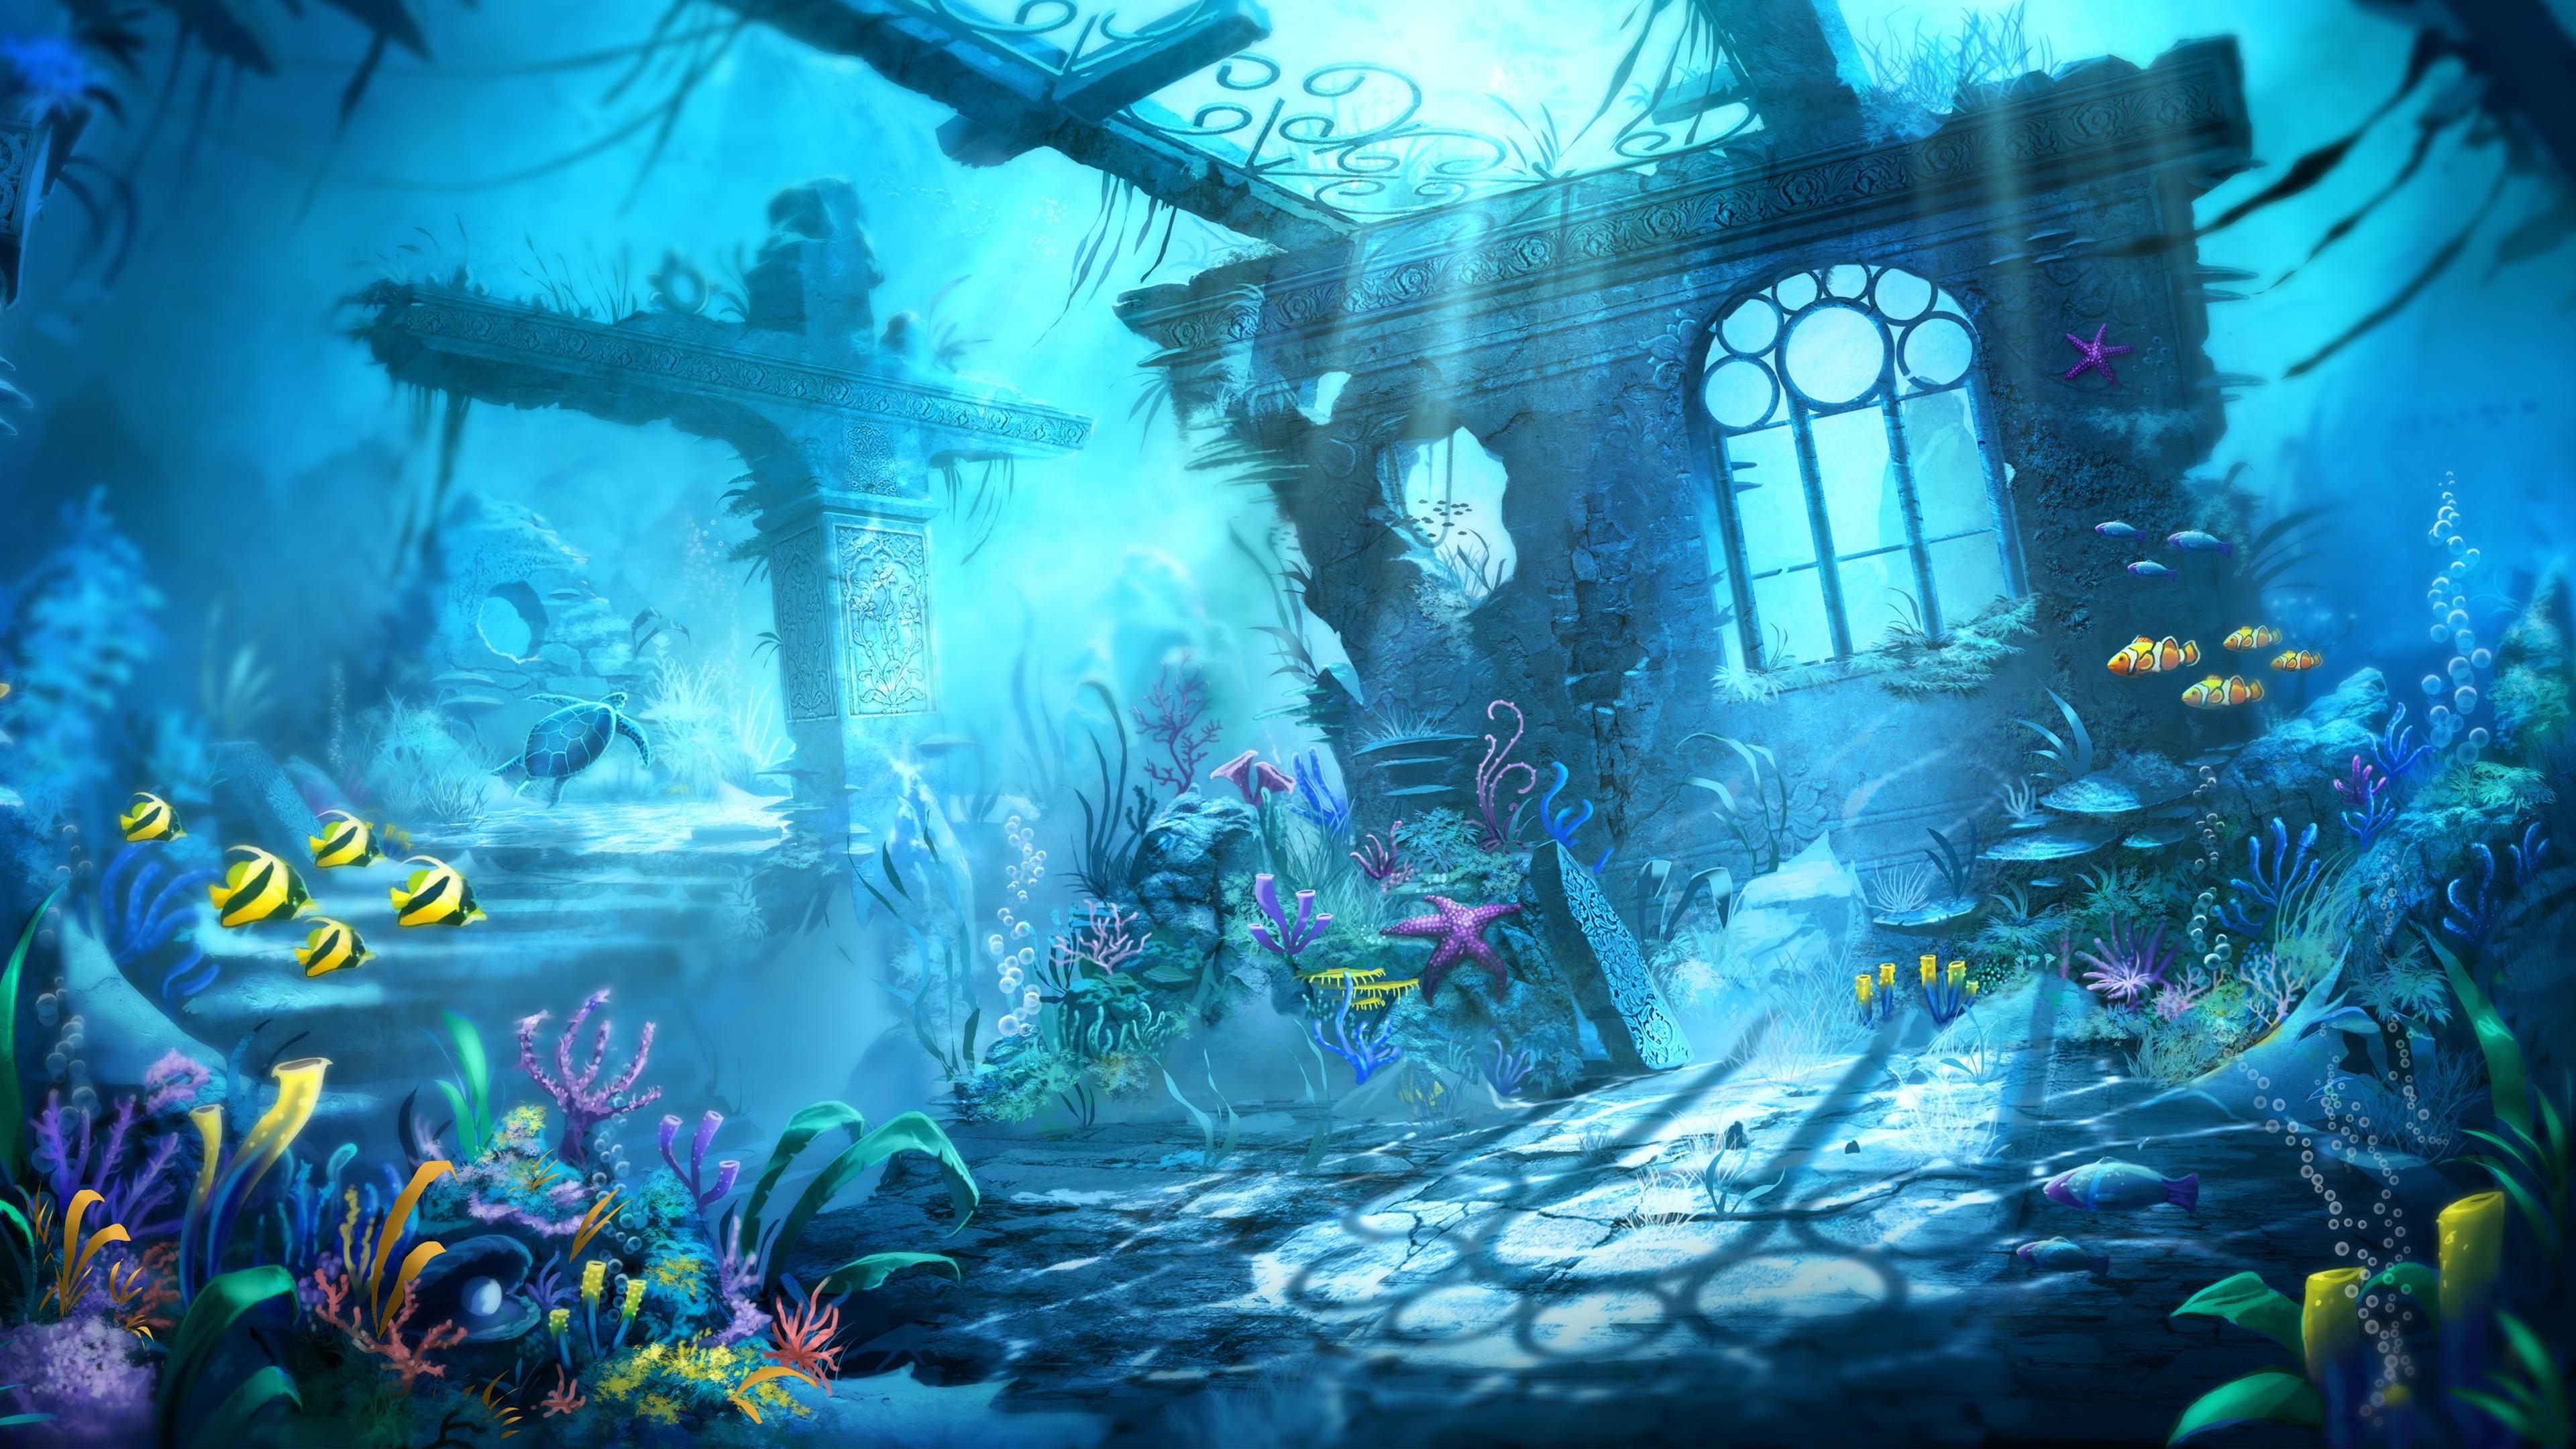 trine underwater scene wallpapers in jpg format for free download